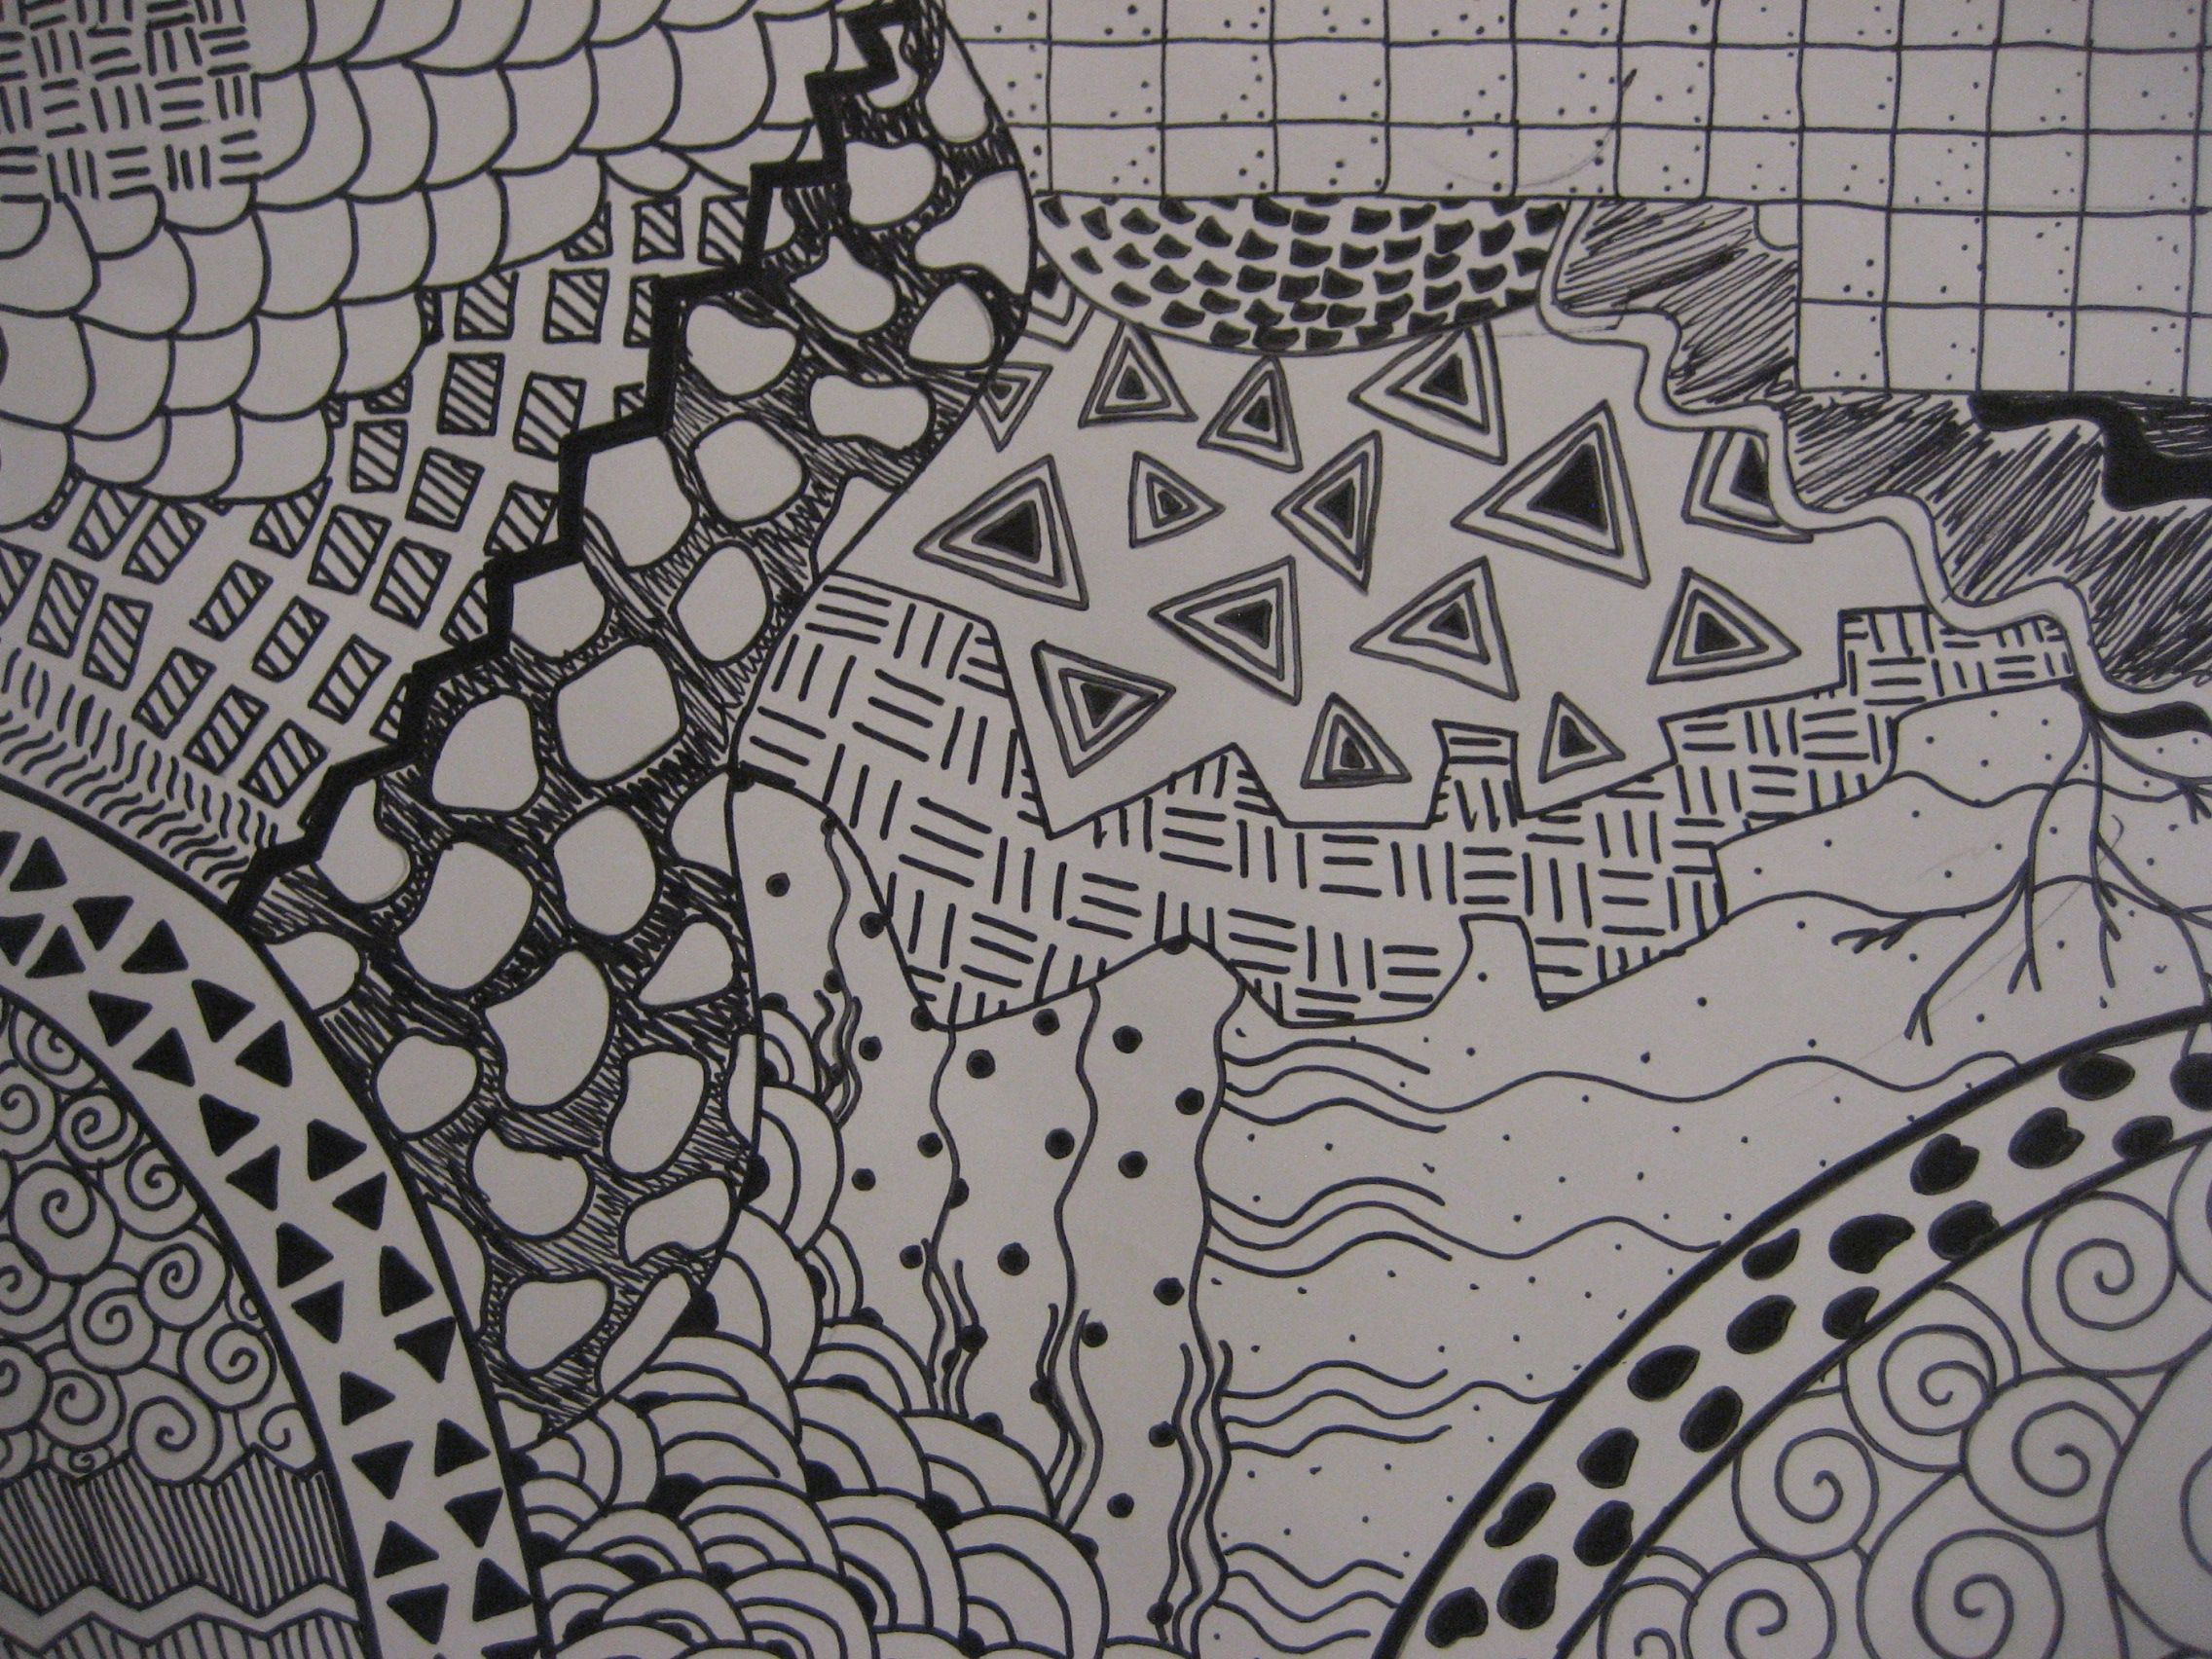 Line Drawing Zentangle : Creative line drawing zentangle my middle school